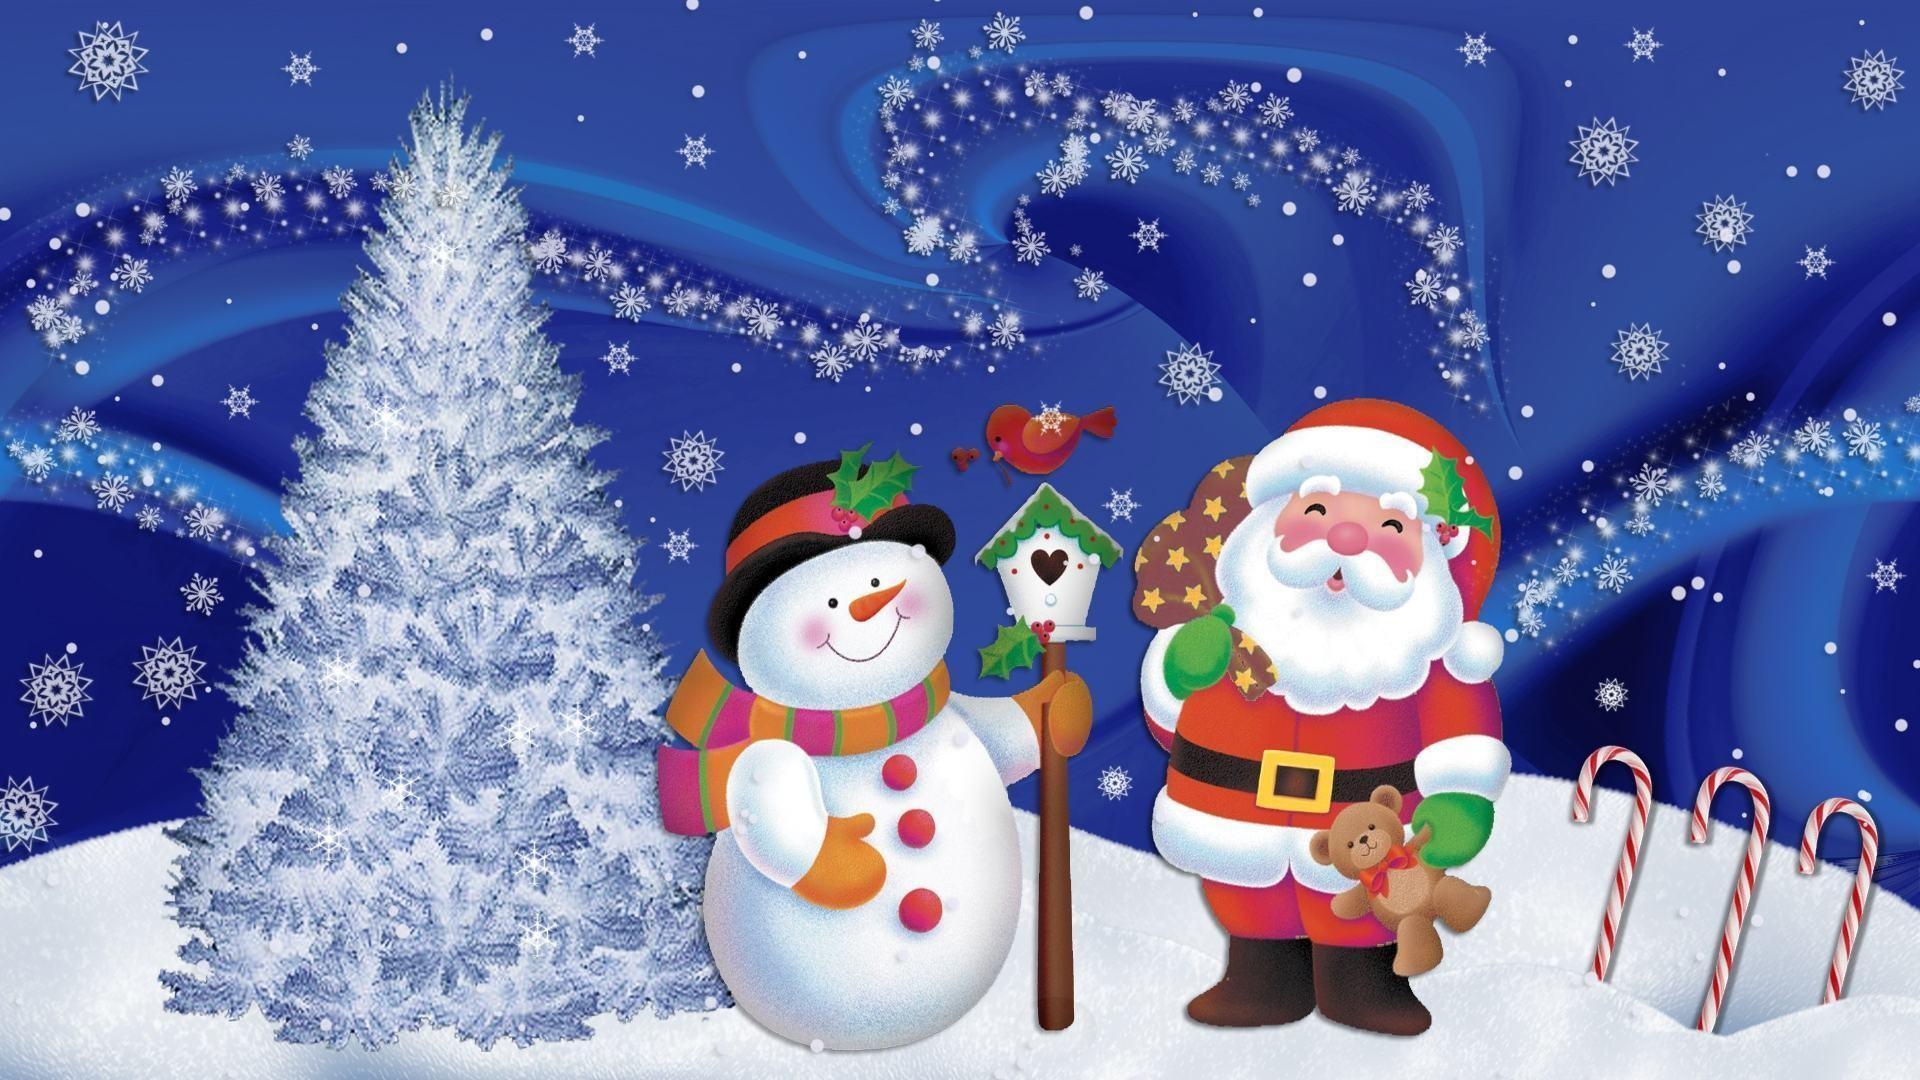 Christmas Anime Scene Wallpaper Background #81144 – Ehiyo.com